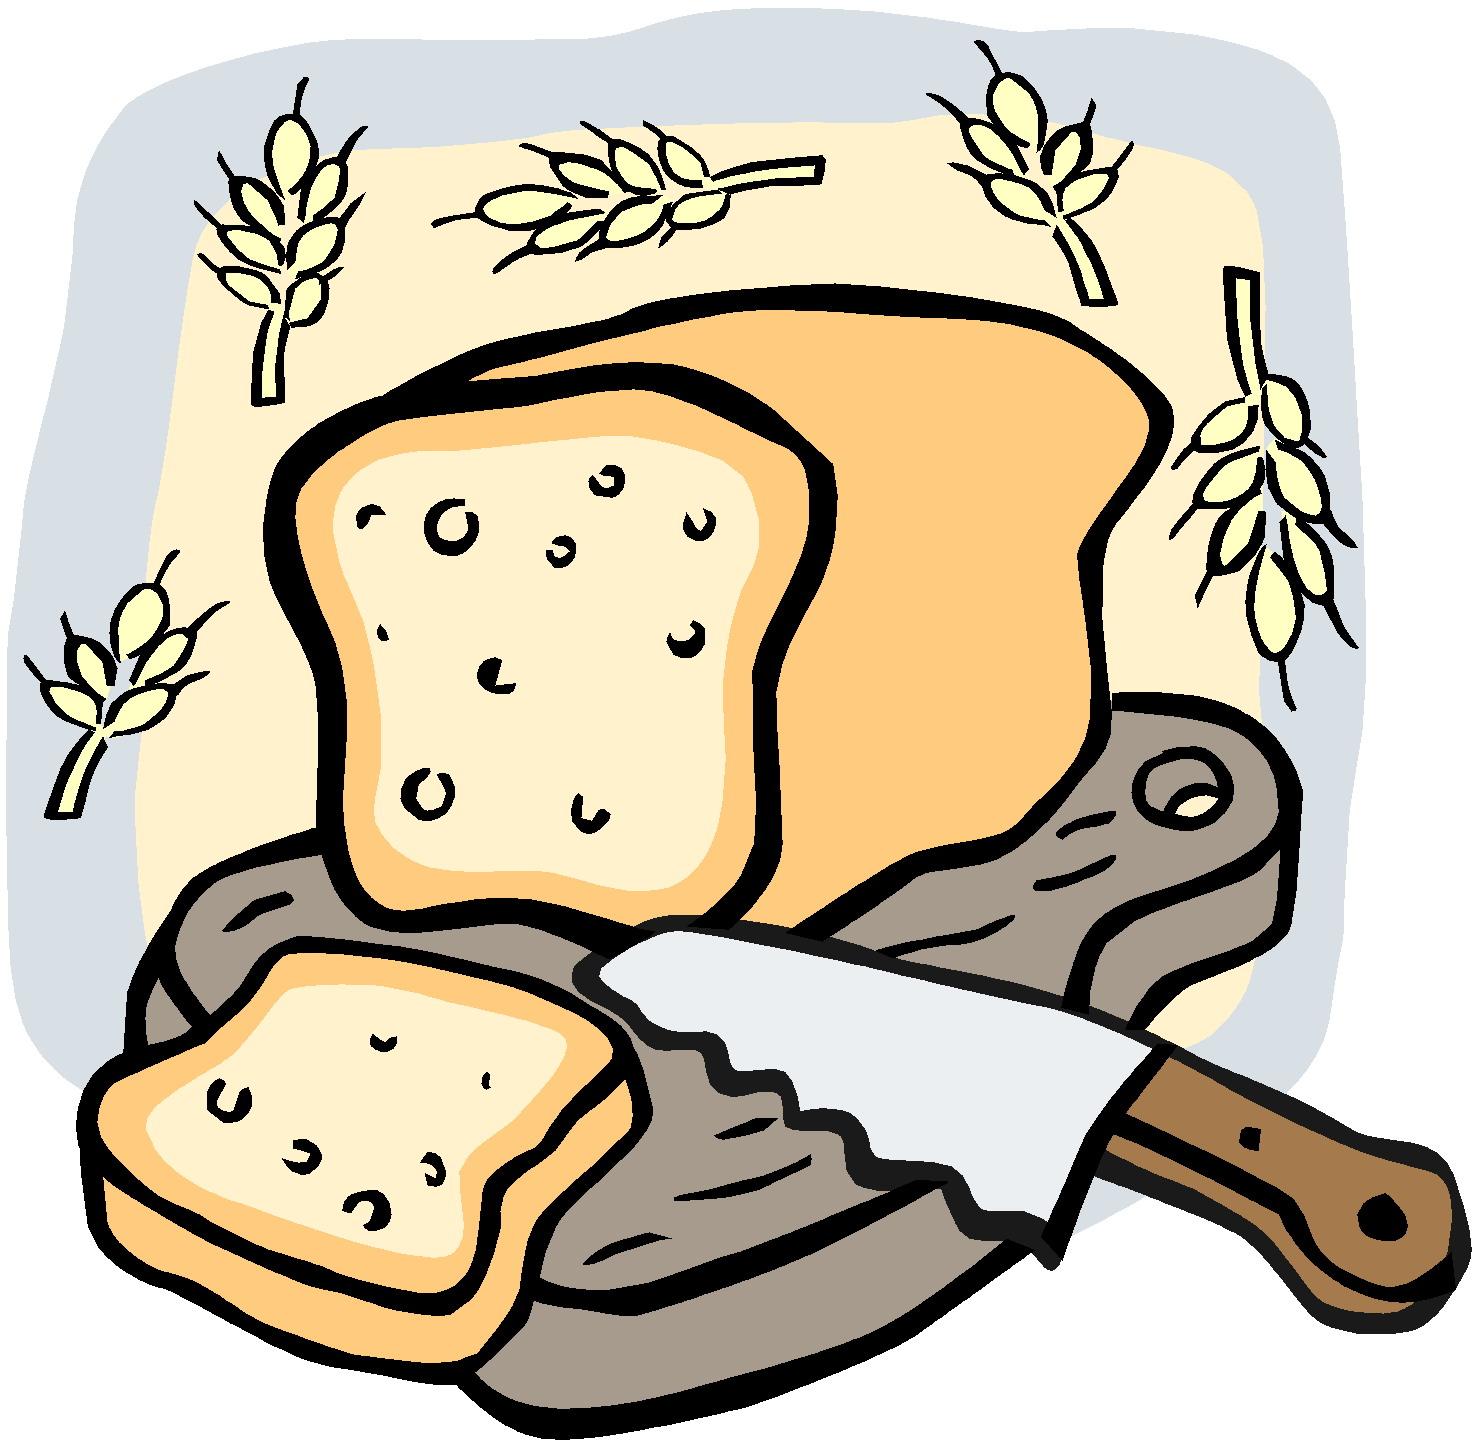 Image - Clipart-bread-sliced.jpg - Luceti Wiki